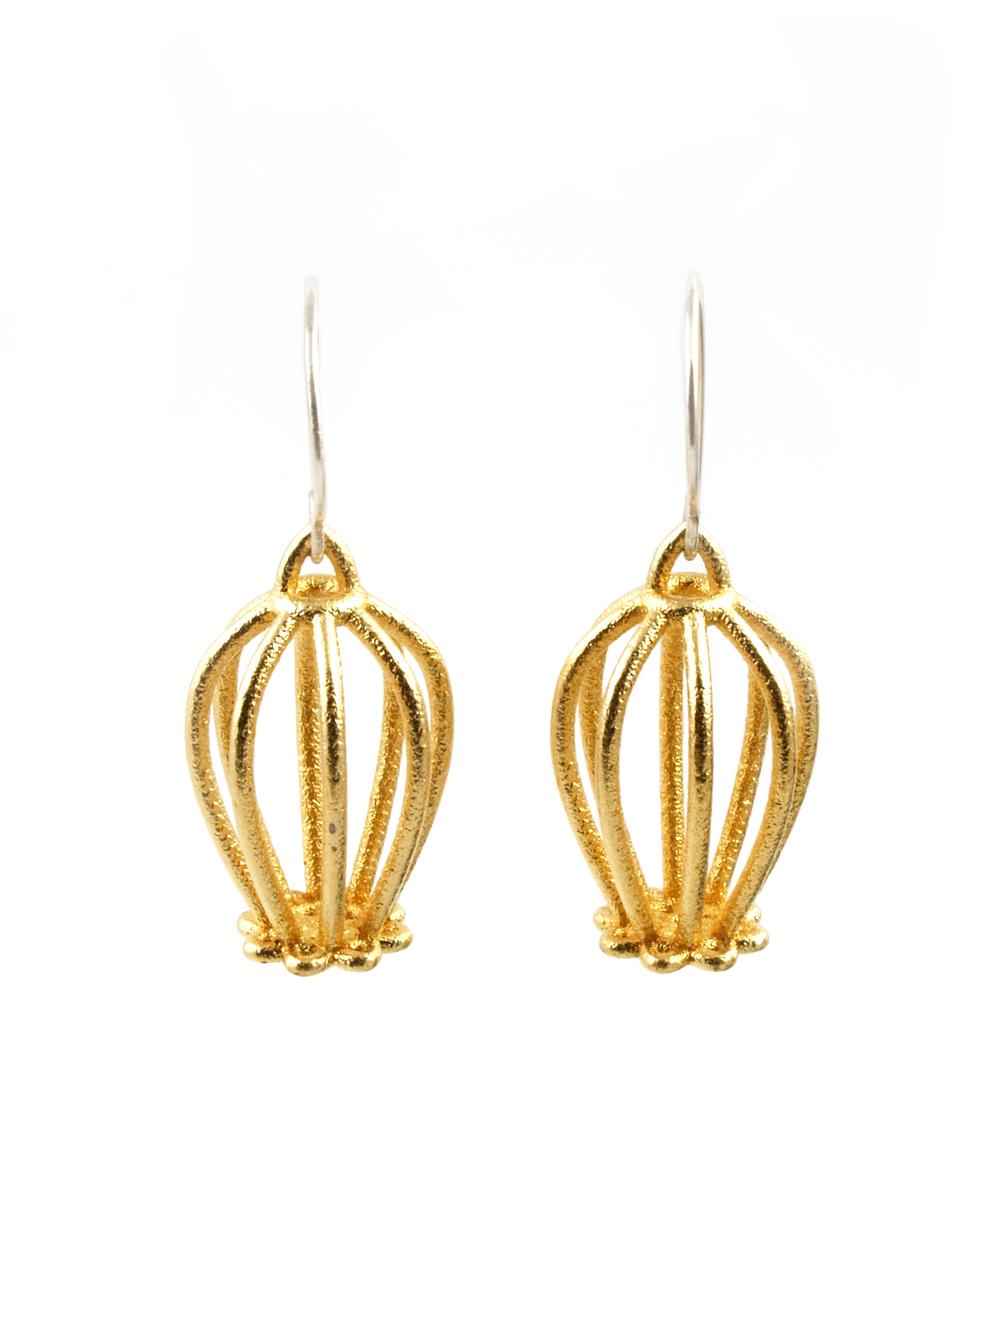 3D Doily Drop gold plated.jpg